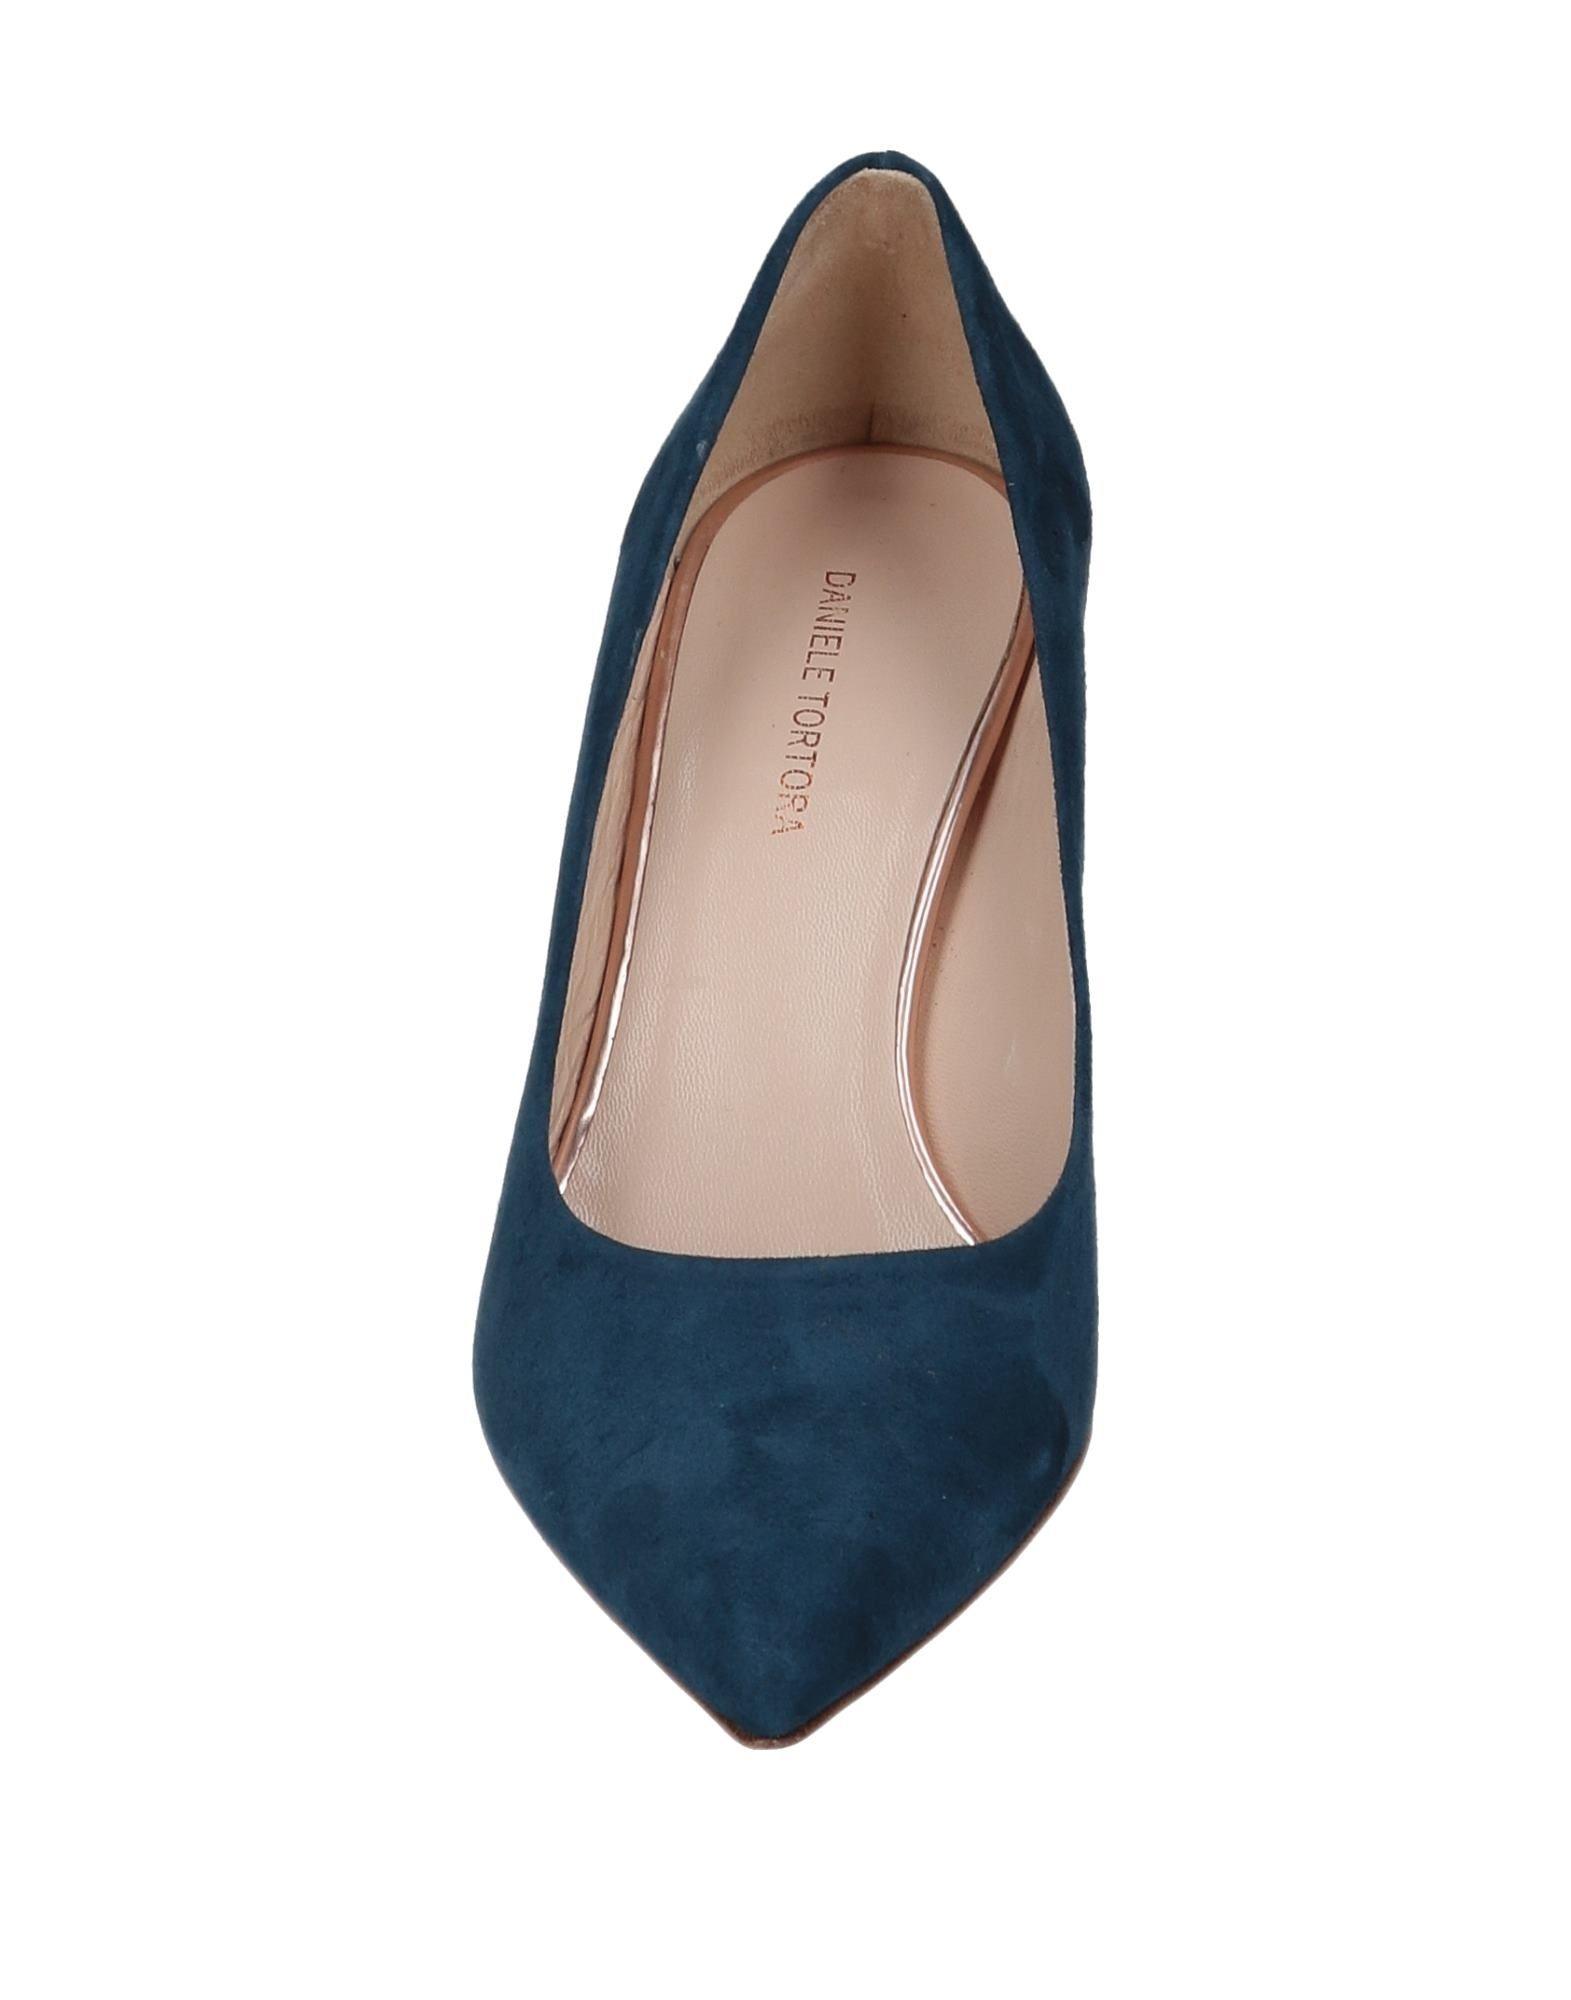 Daniele Tortora Gute Pumps Damen  11550163IW Gute Tortora Qualität beliebte Schuhe 918e7c